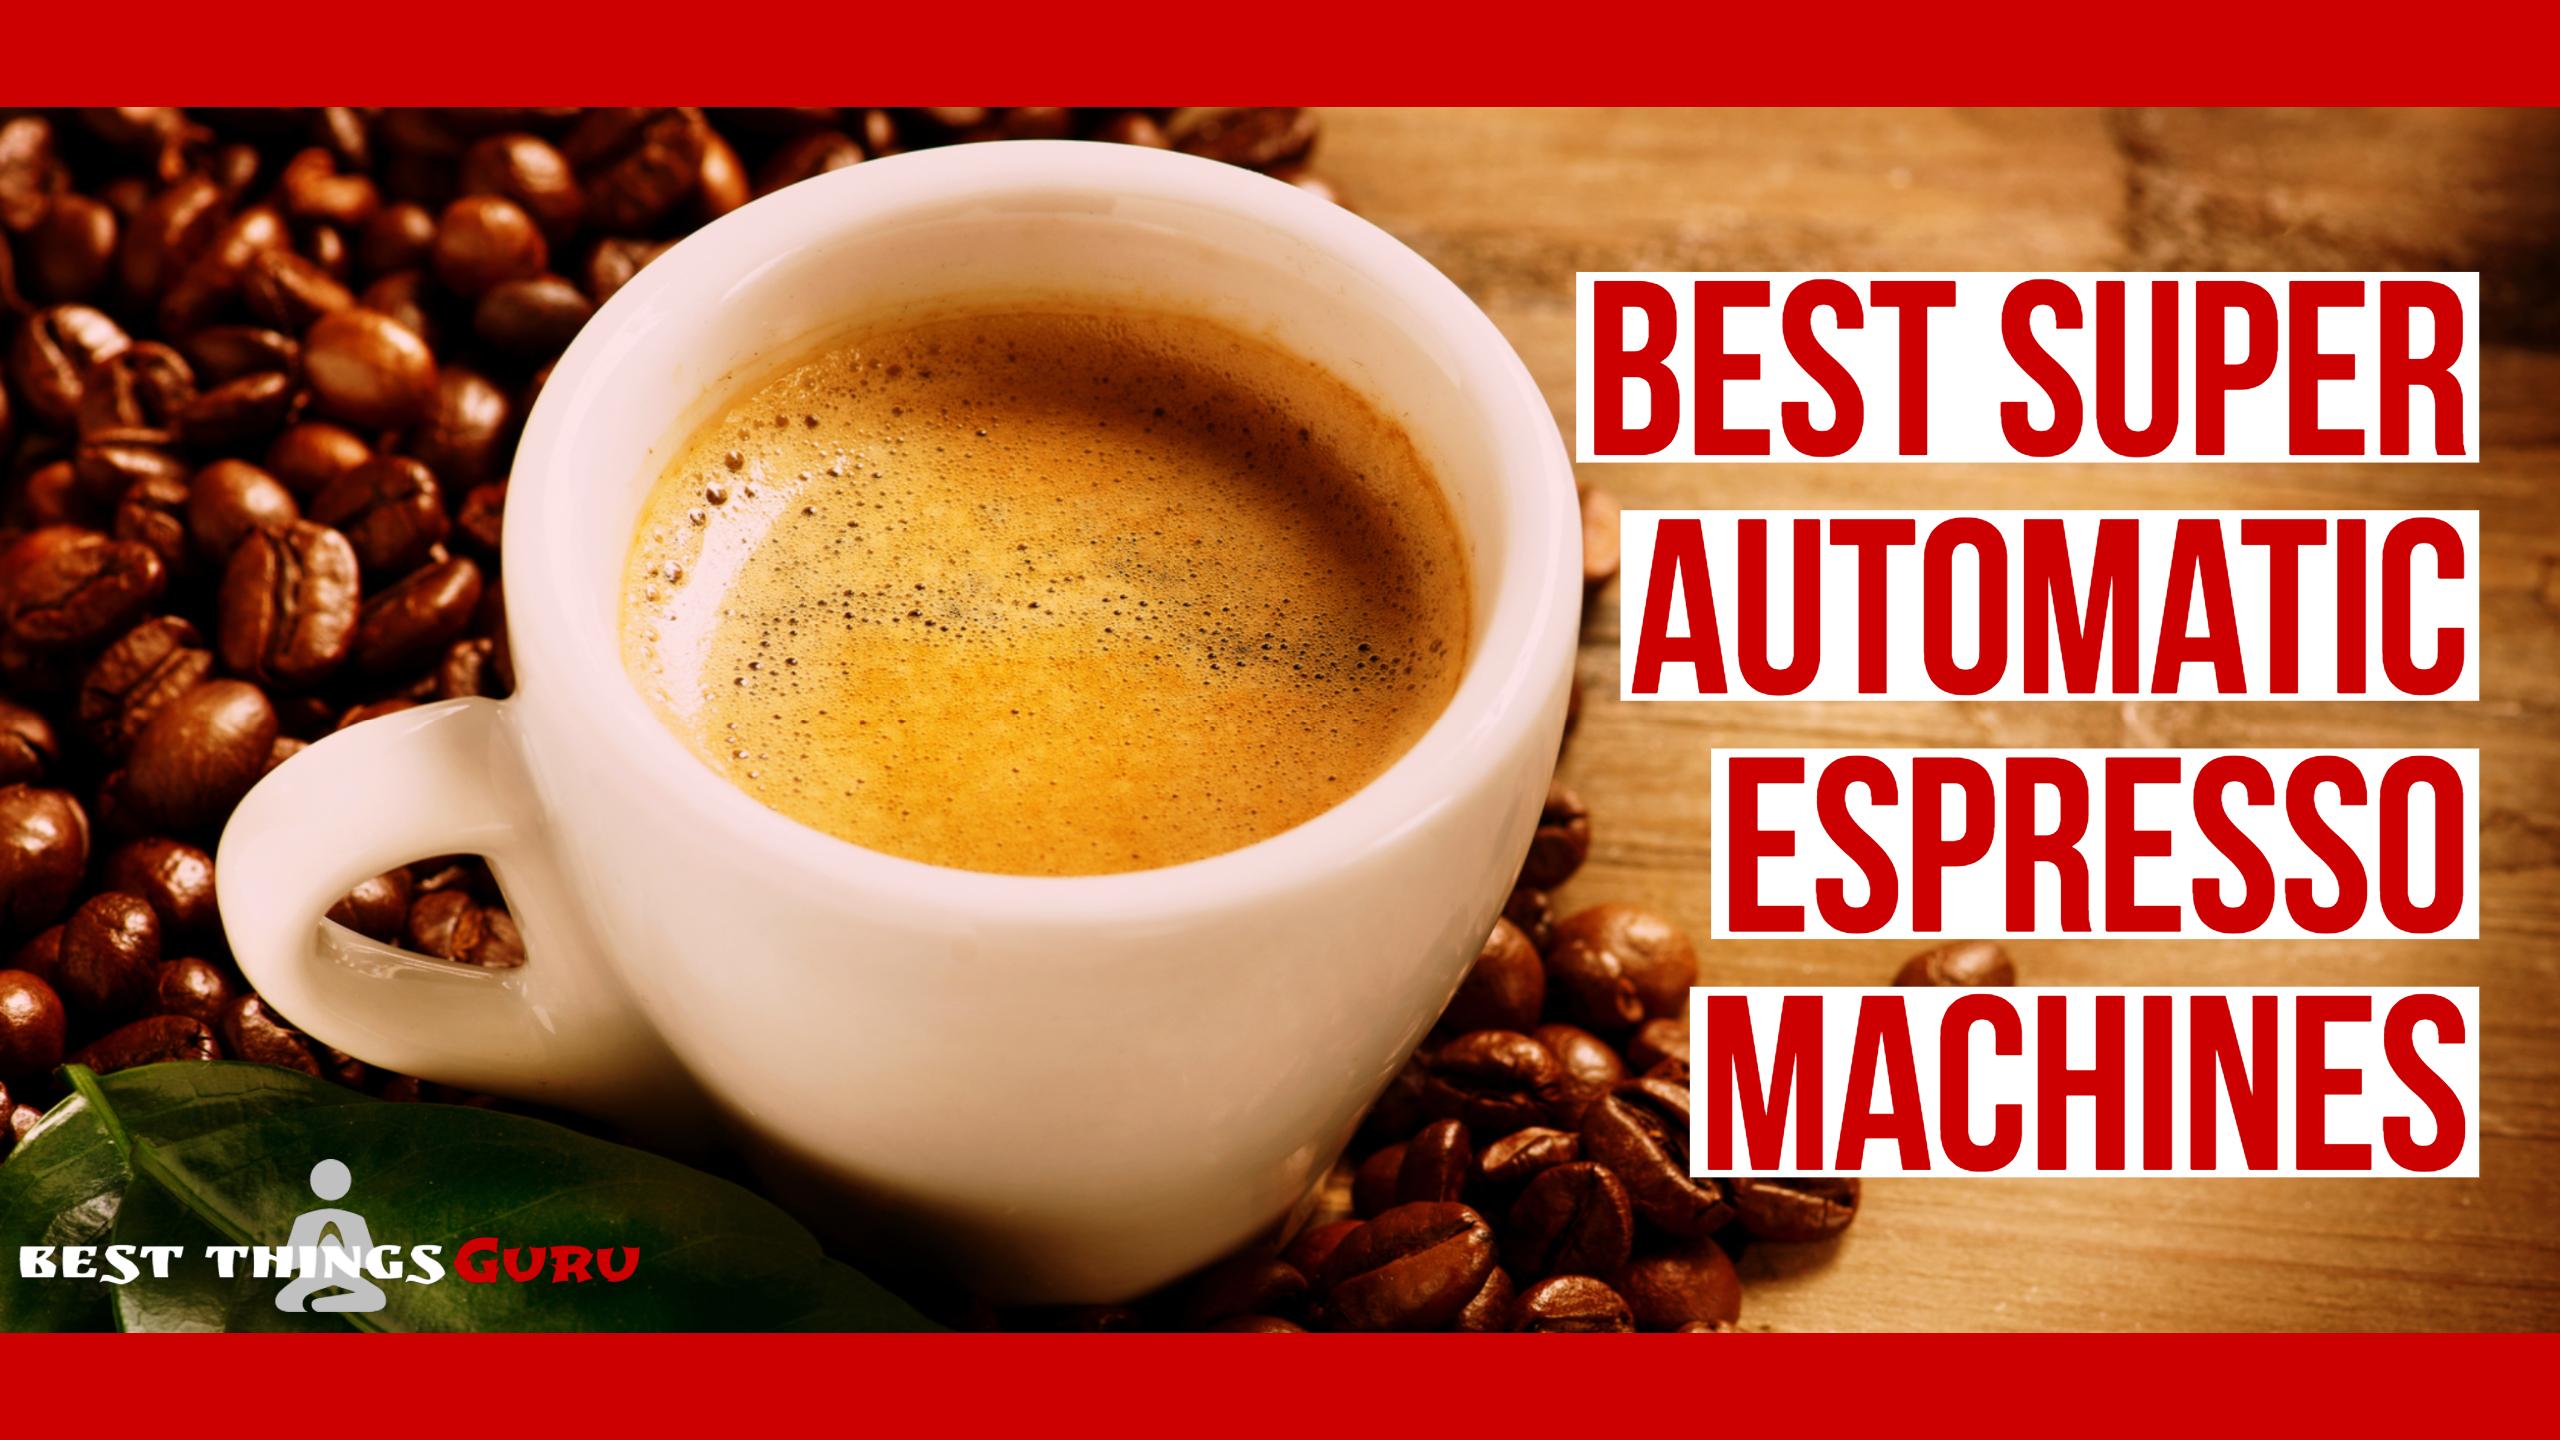 Review: Jura X8 Super Automatic Espresso machine - YouTube